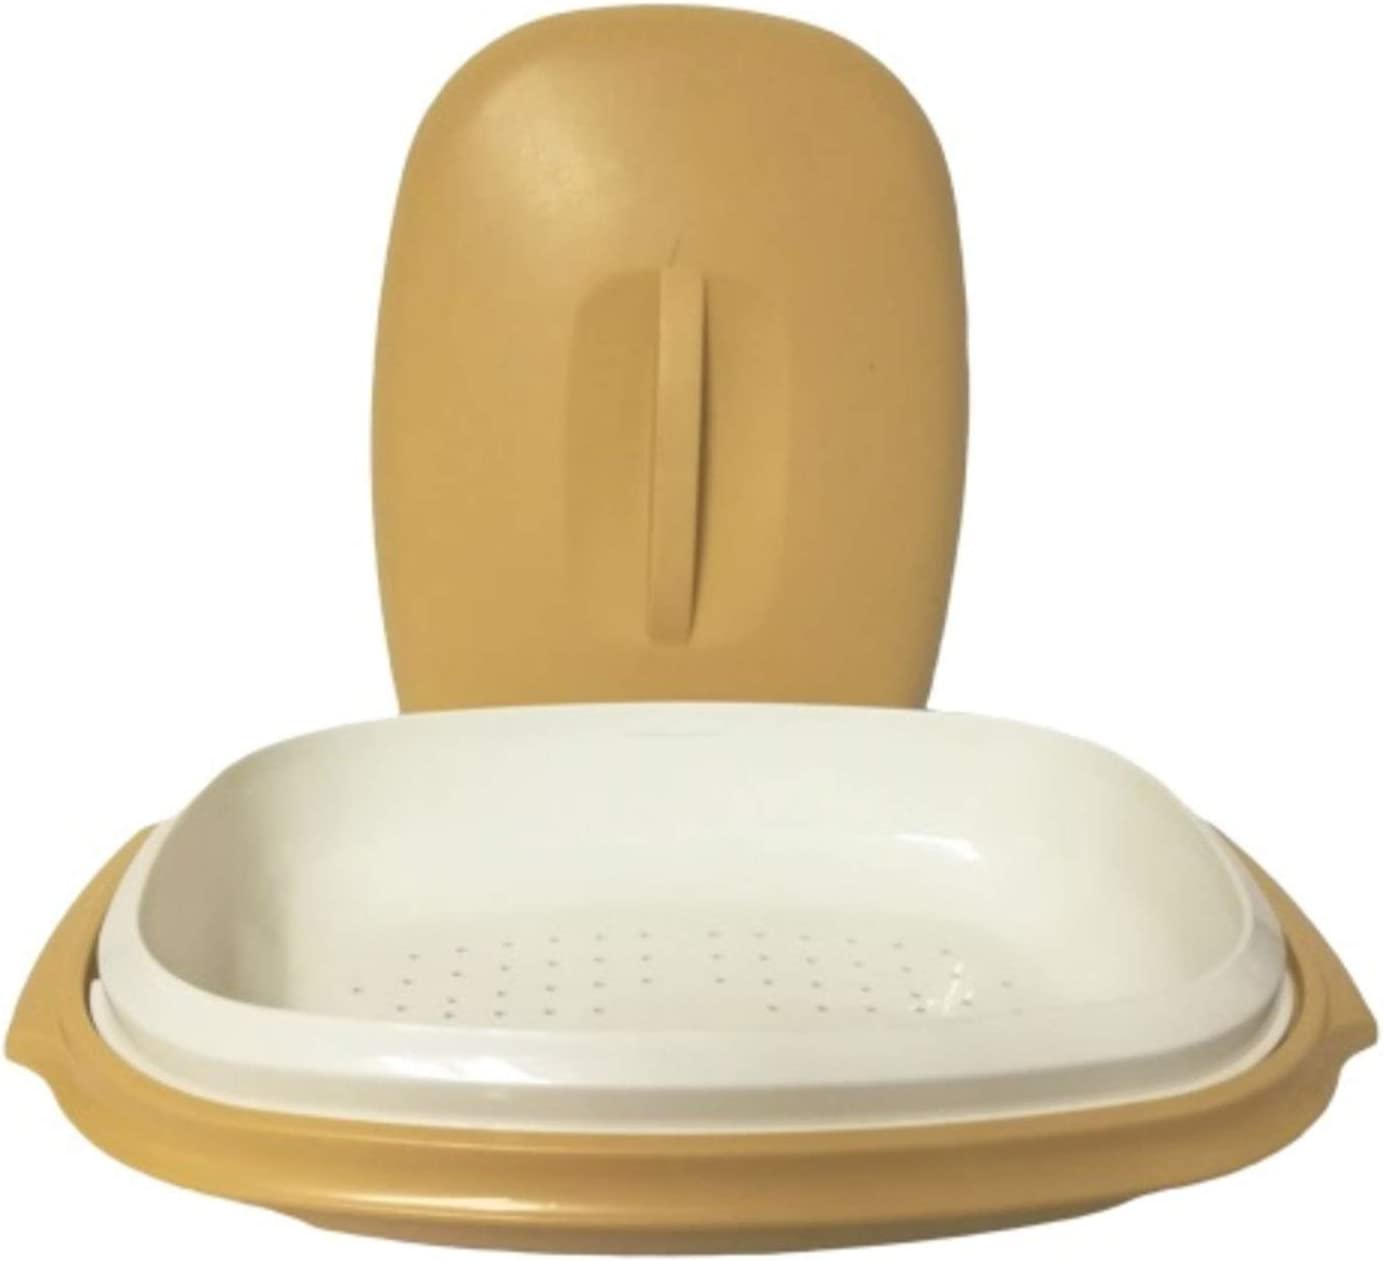 Pink or Harvest Gold 3 Piece Serving Dish Square Vintage Tupperware Steamer {Plastic Microwave Tupper Ware Steamer for Veggies} Pick one